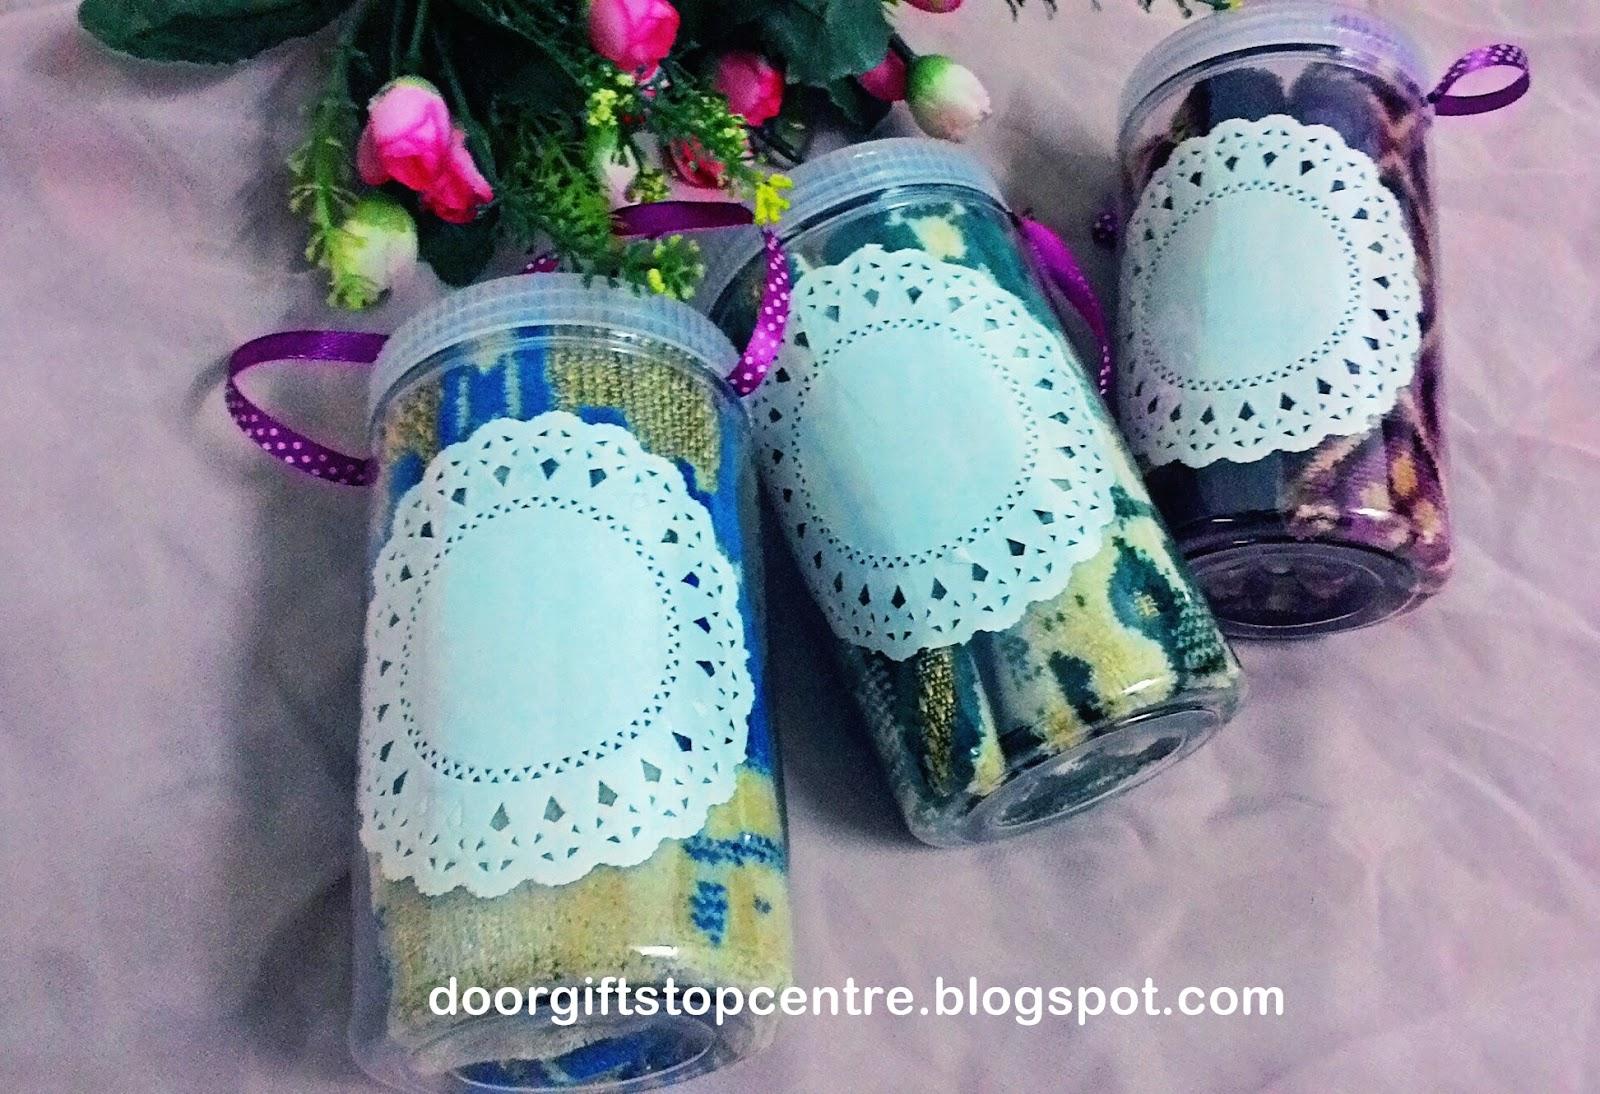 Door Gift For All Reason Mini Sejadah Doorgift